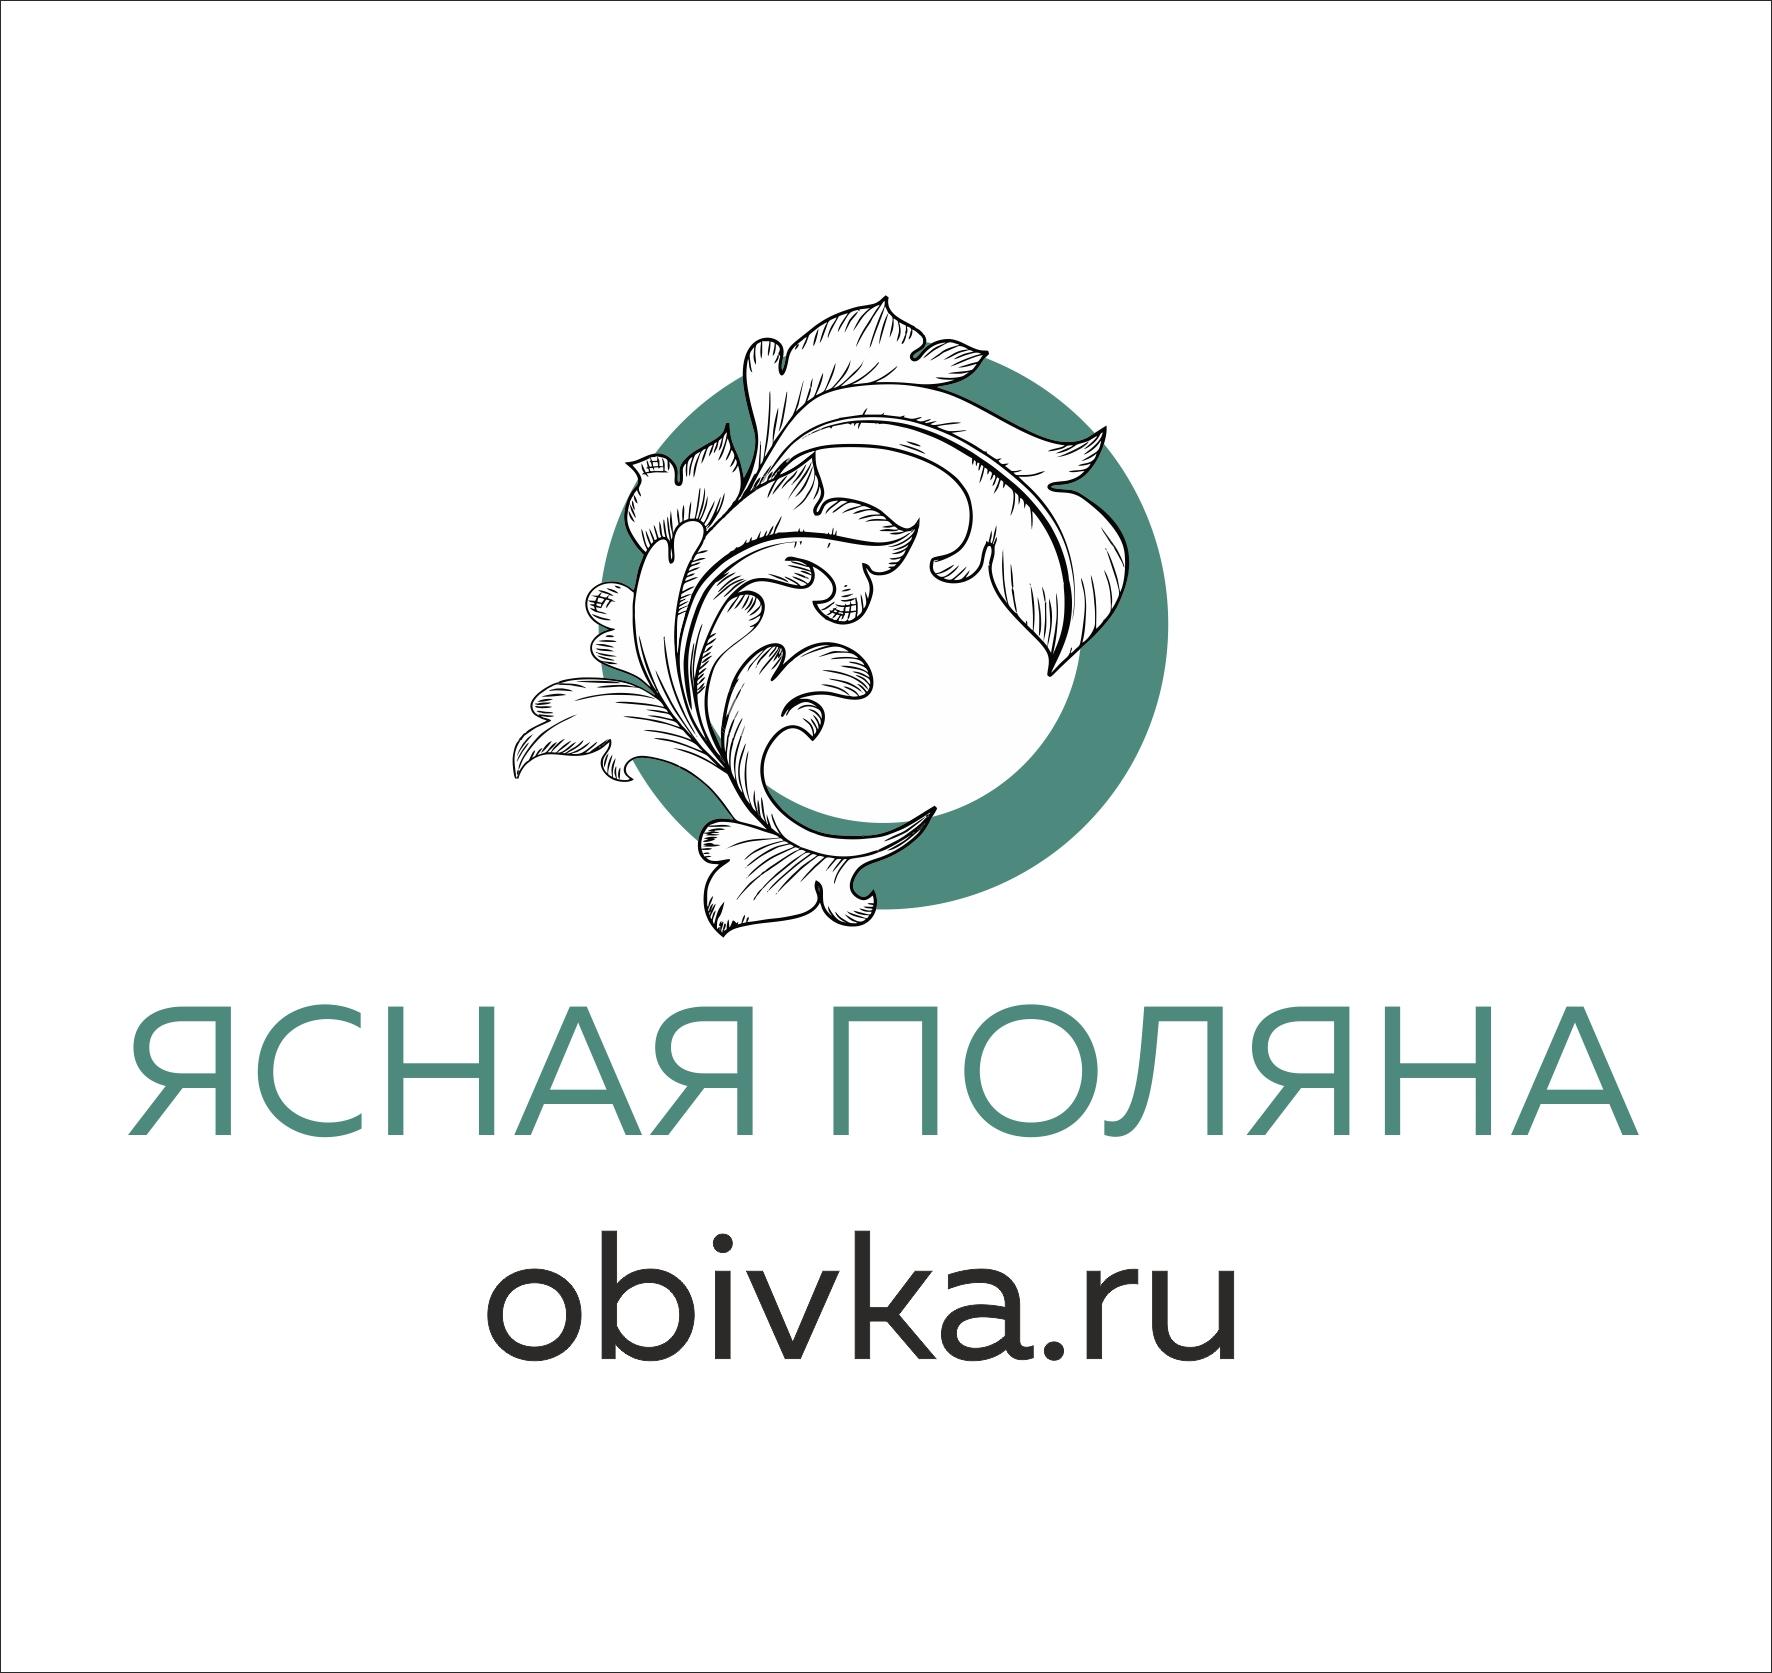 Логотип для сайта OBIVKA.RU фото f_2695c1fe04ce8d21.jpg